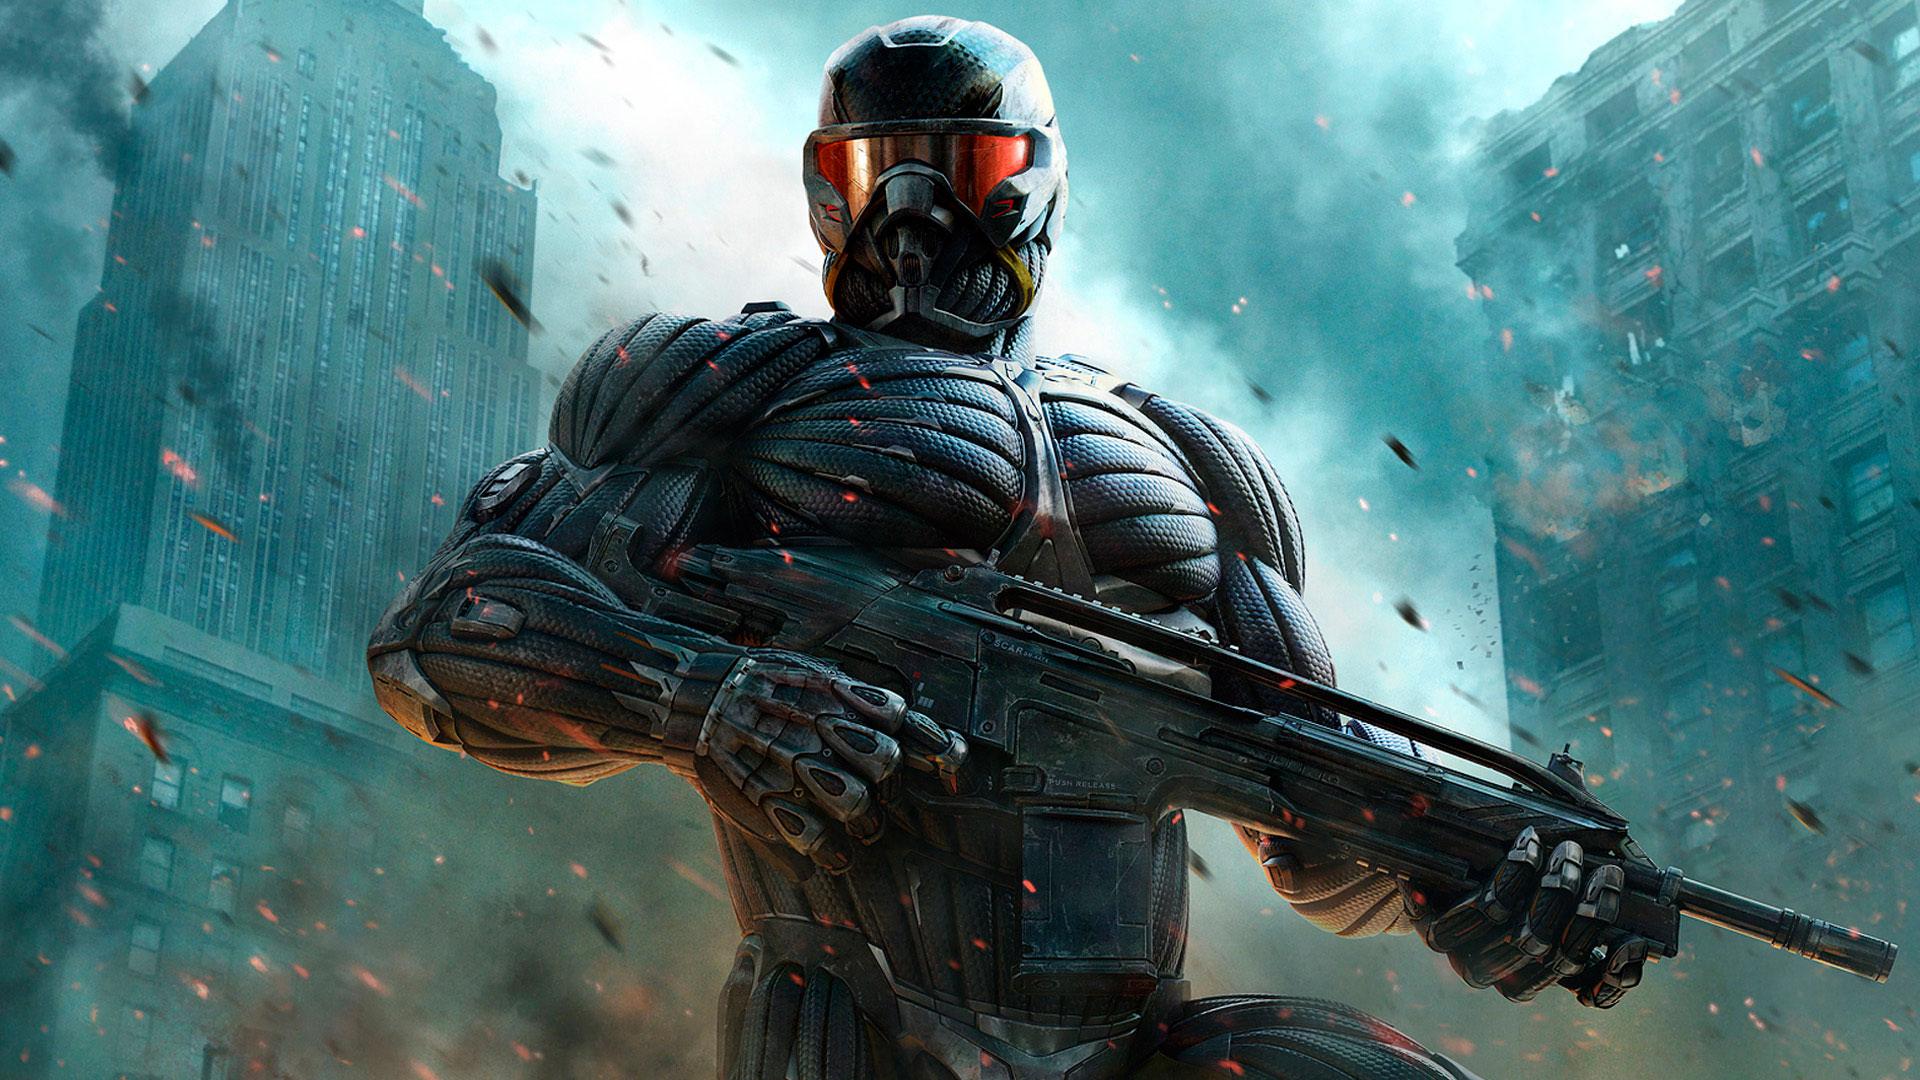 Меломанам на заметку: топ 7 саундтреков из игр 12